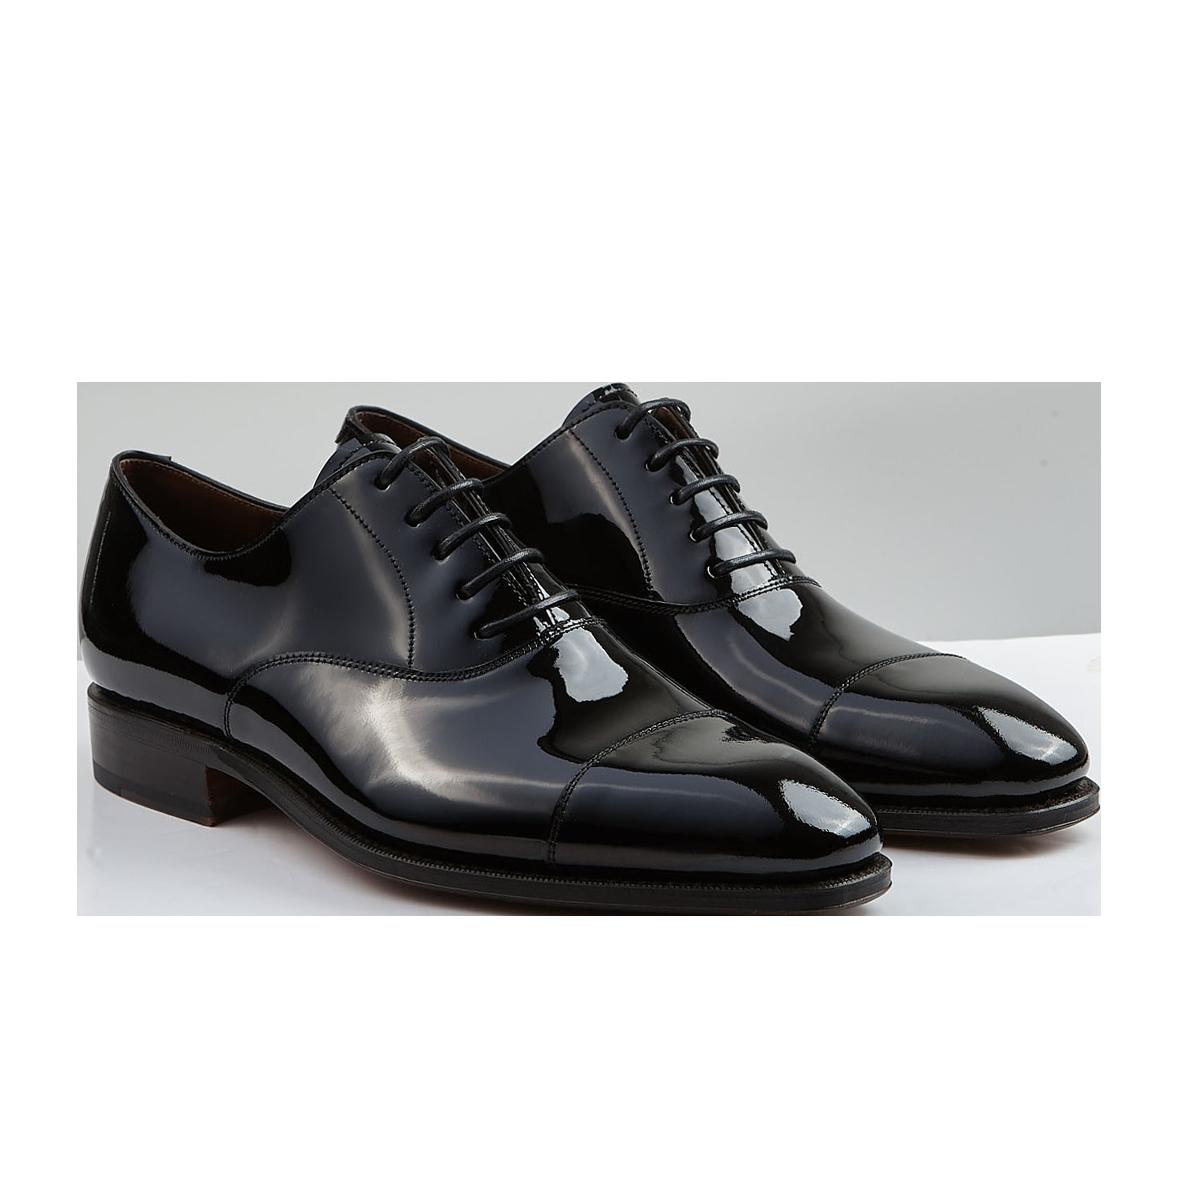 Carmina Black Rain Patent Leather Oxford Shoes Front